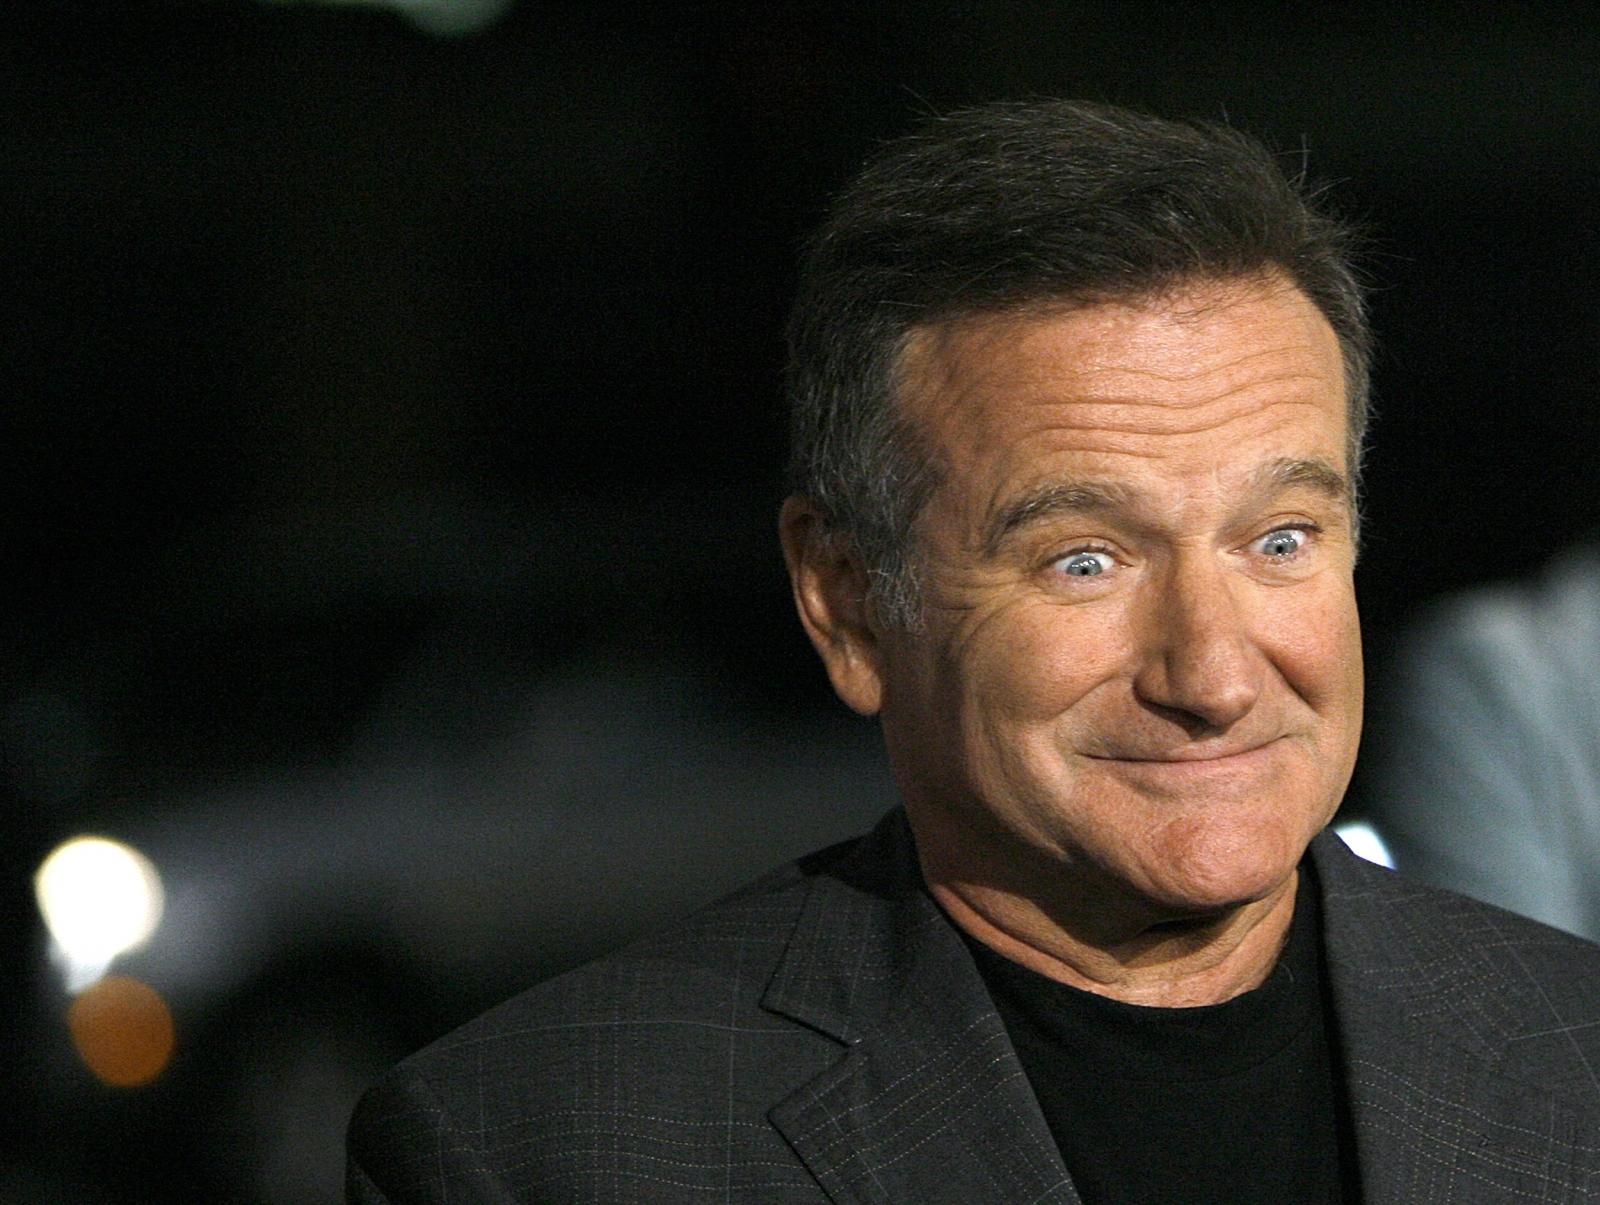 Why is Robin Williams' Jumanji the Isis Jihadi's Favourite